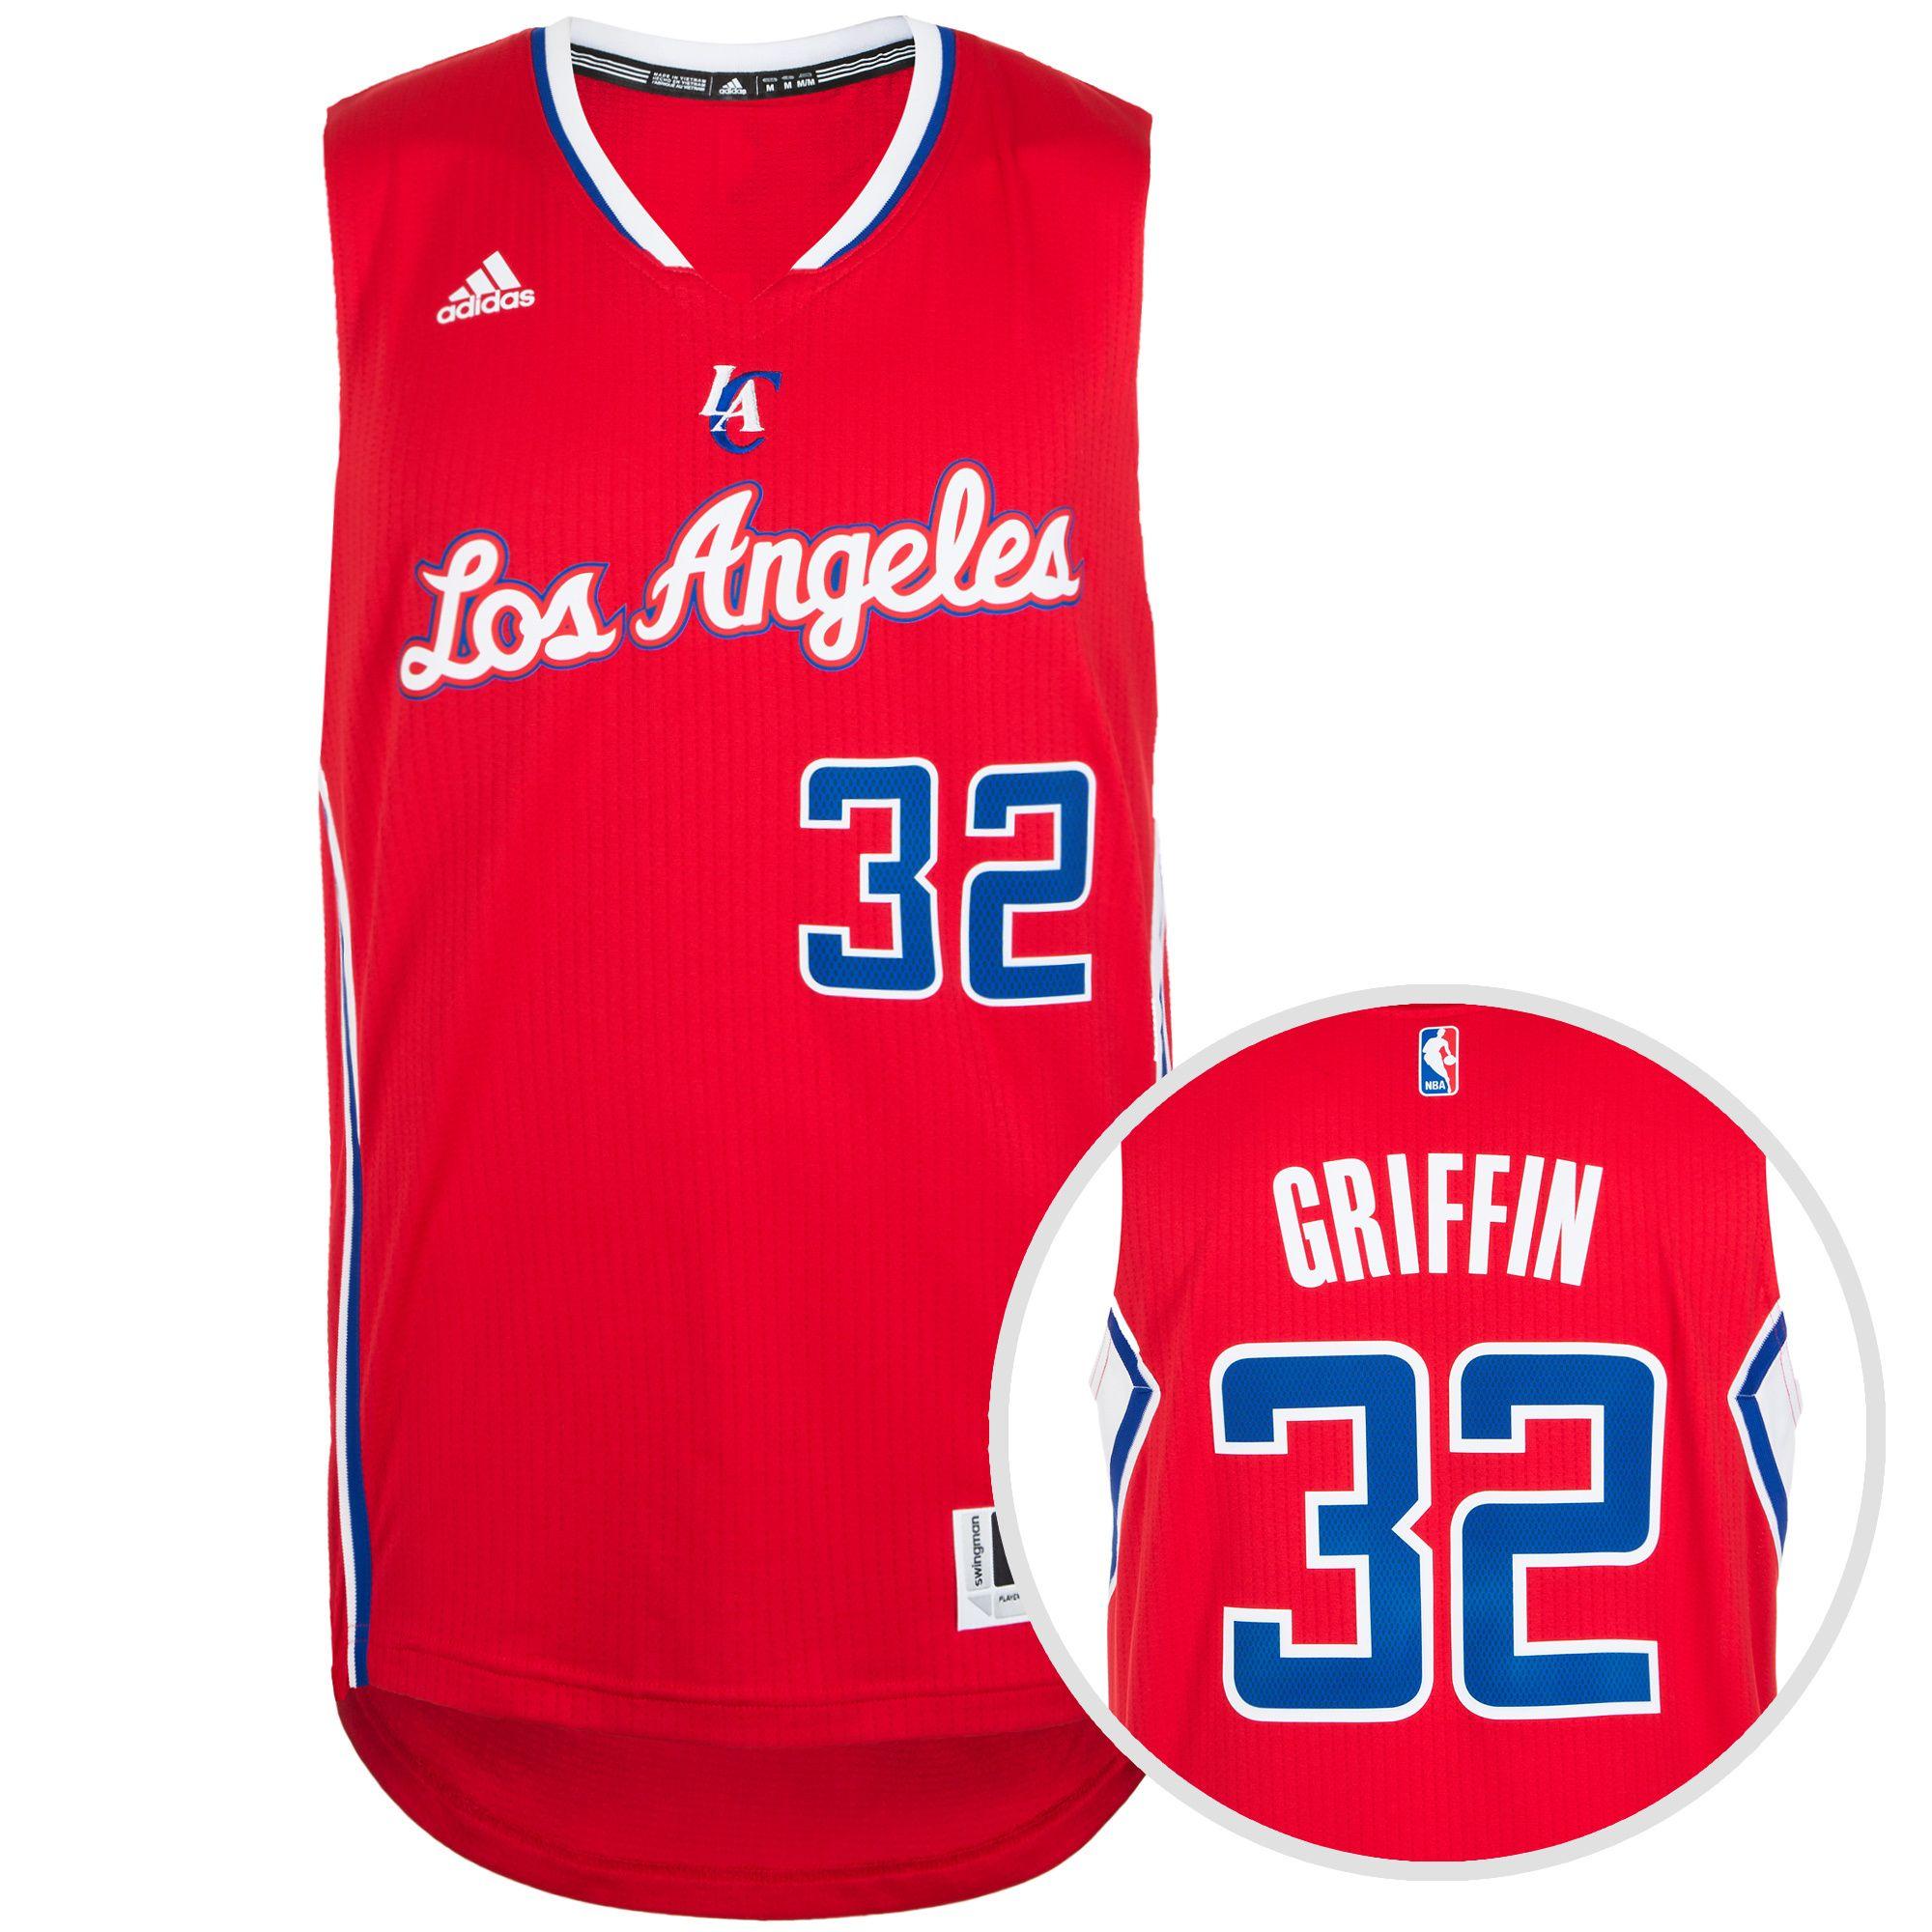 ADIDAS PERFORMANCE adidas Performance LA Clippers Griffin Swingman Basketballtrikot Herren